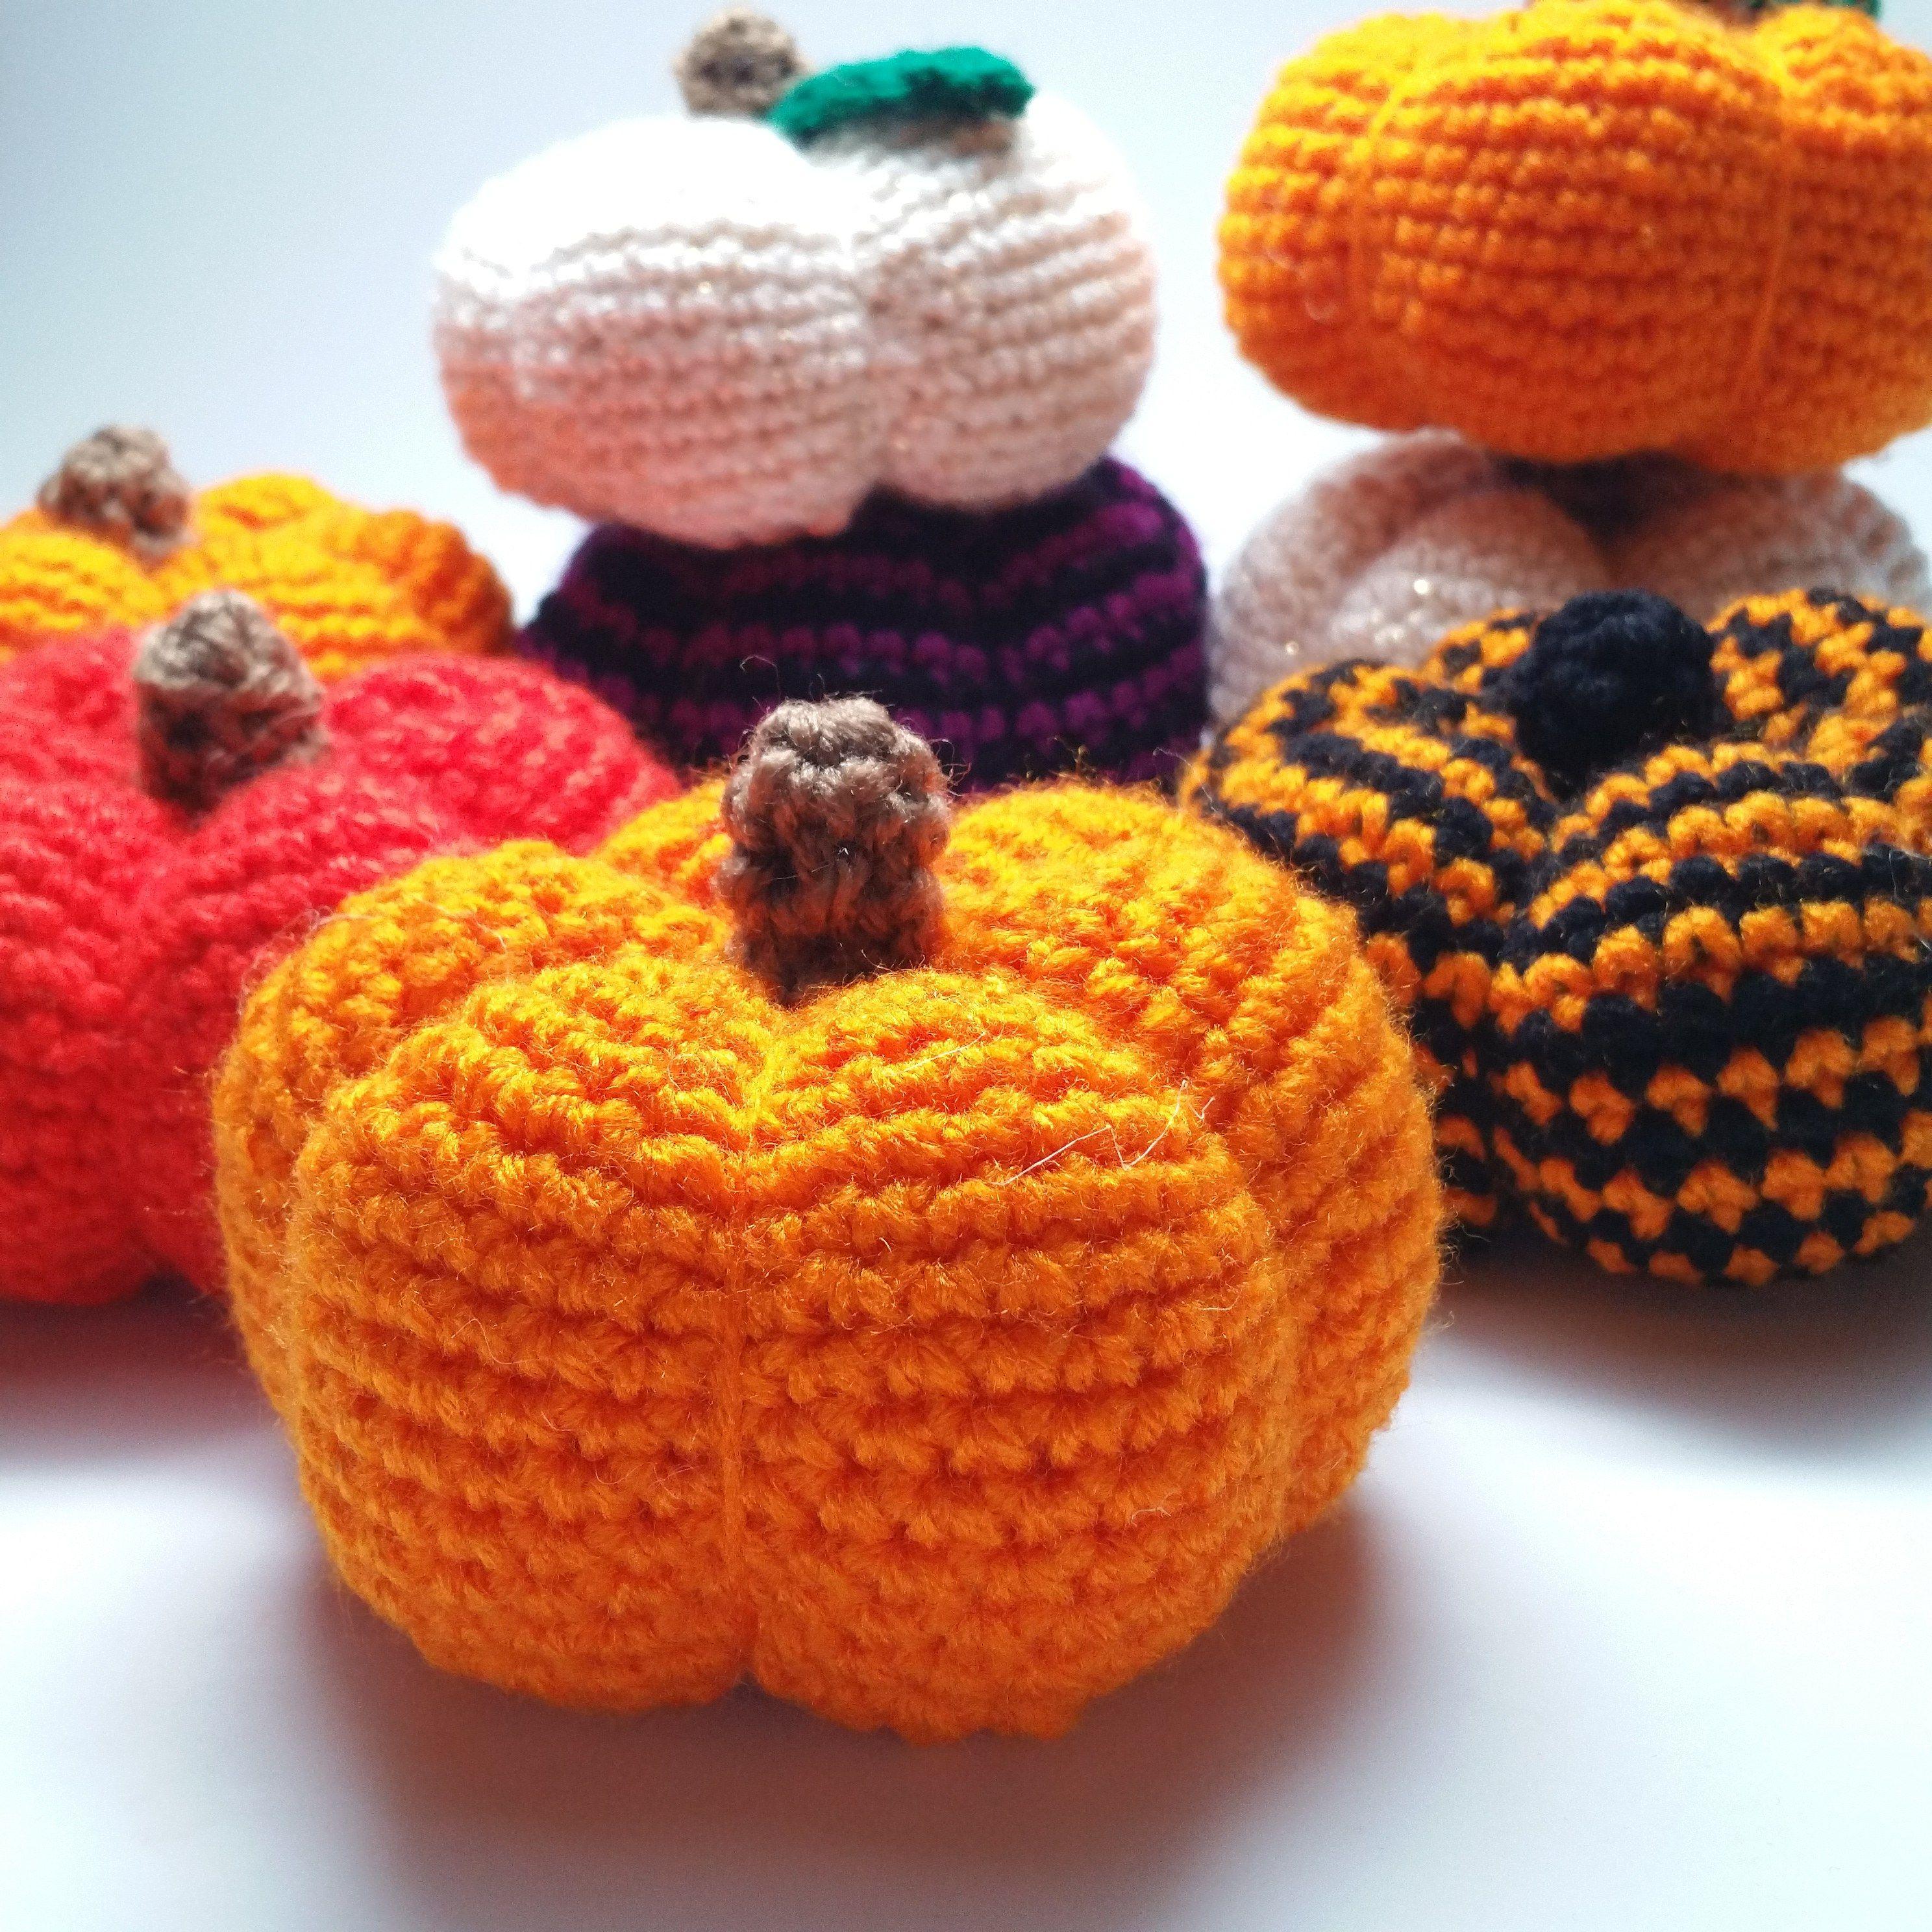 Free Pattern: Pumpkin Amigurumi | Craft-y: Crochet | Pinterest ...